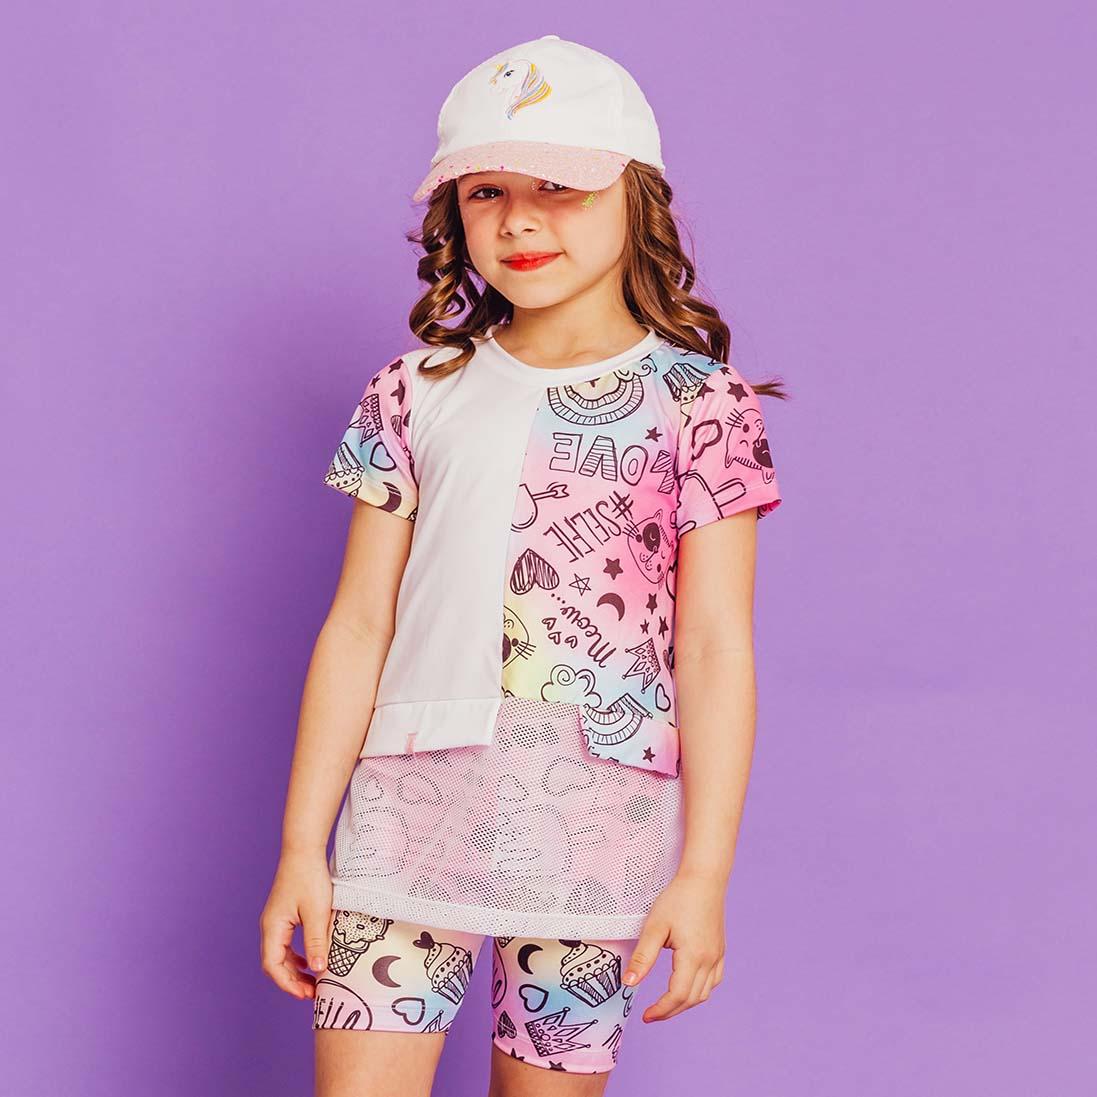 PRÉ-VENDA  - Conjunto Infantil Blusa e Short Ciclista Estampa Tie dye Letras